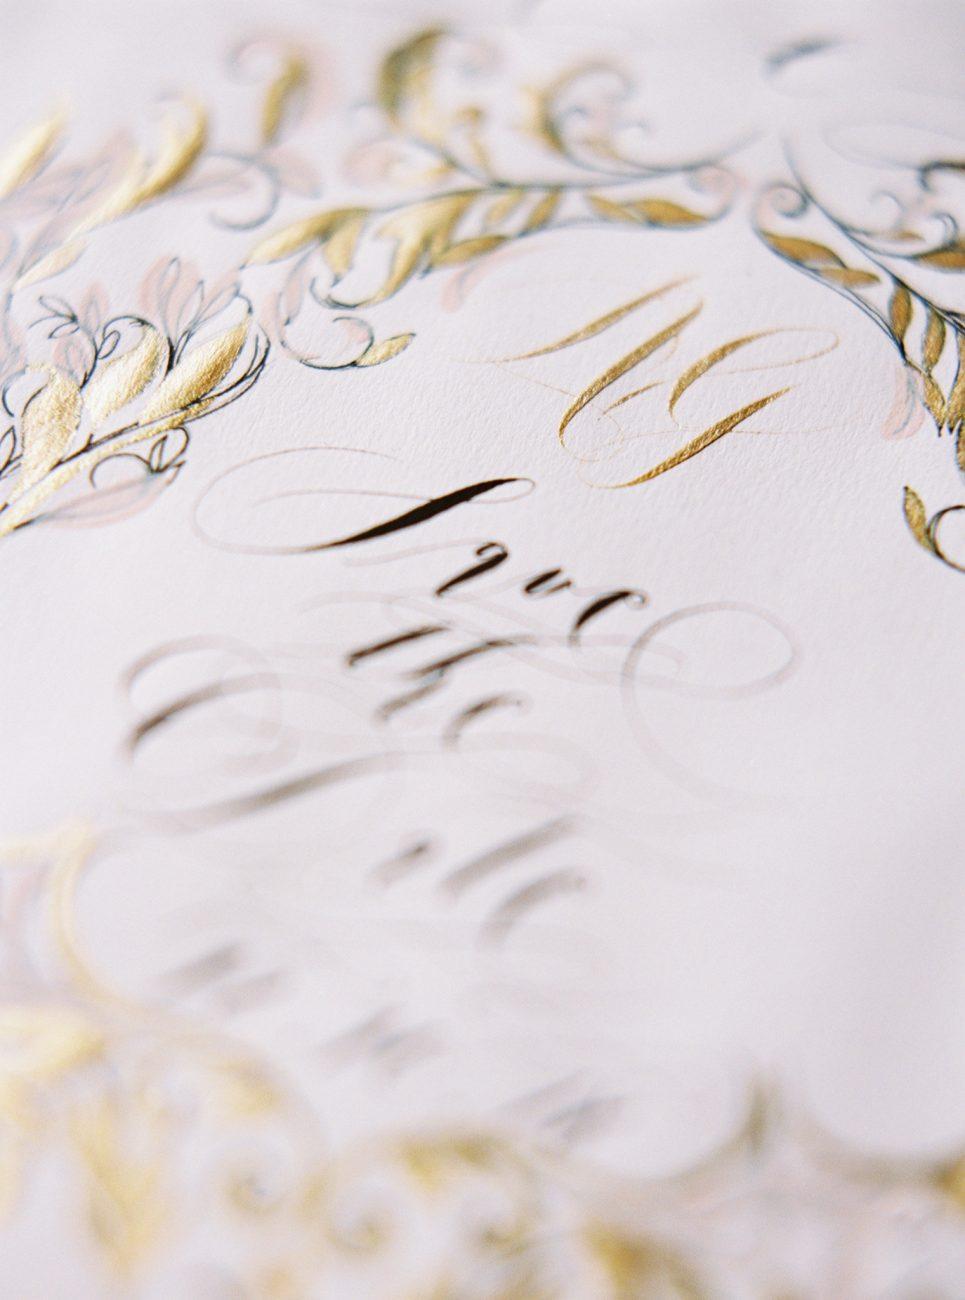 Portuguese themed wedding invitations copy